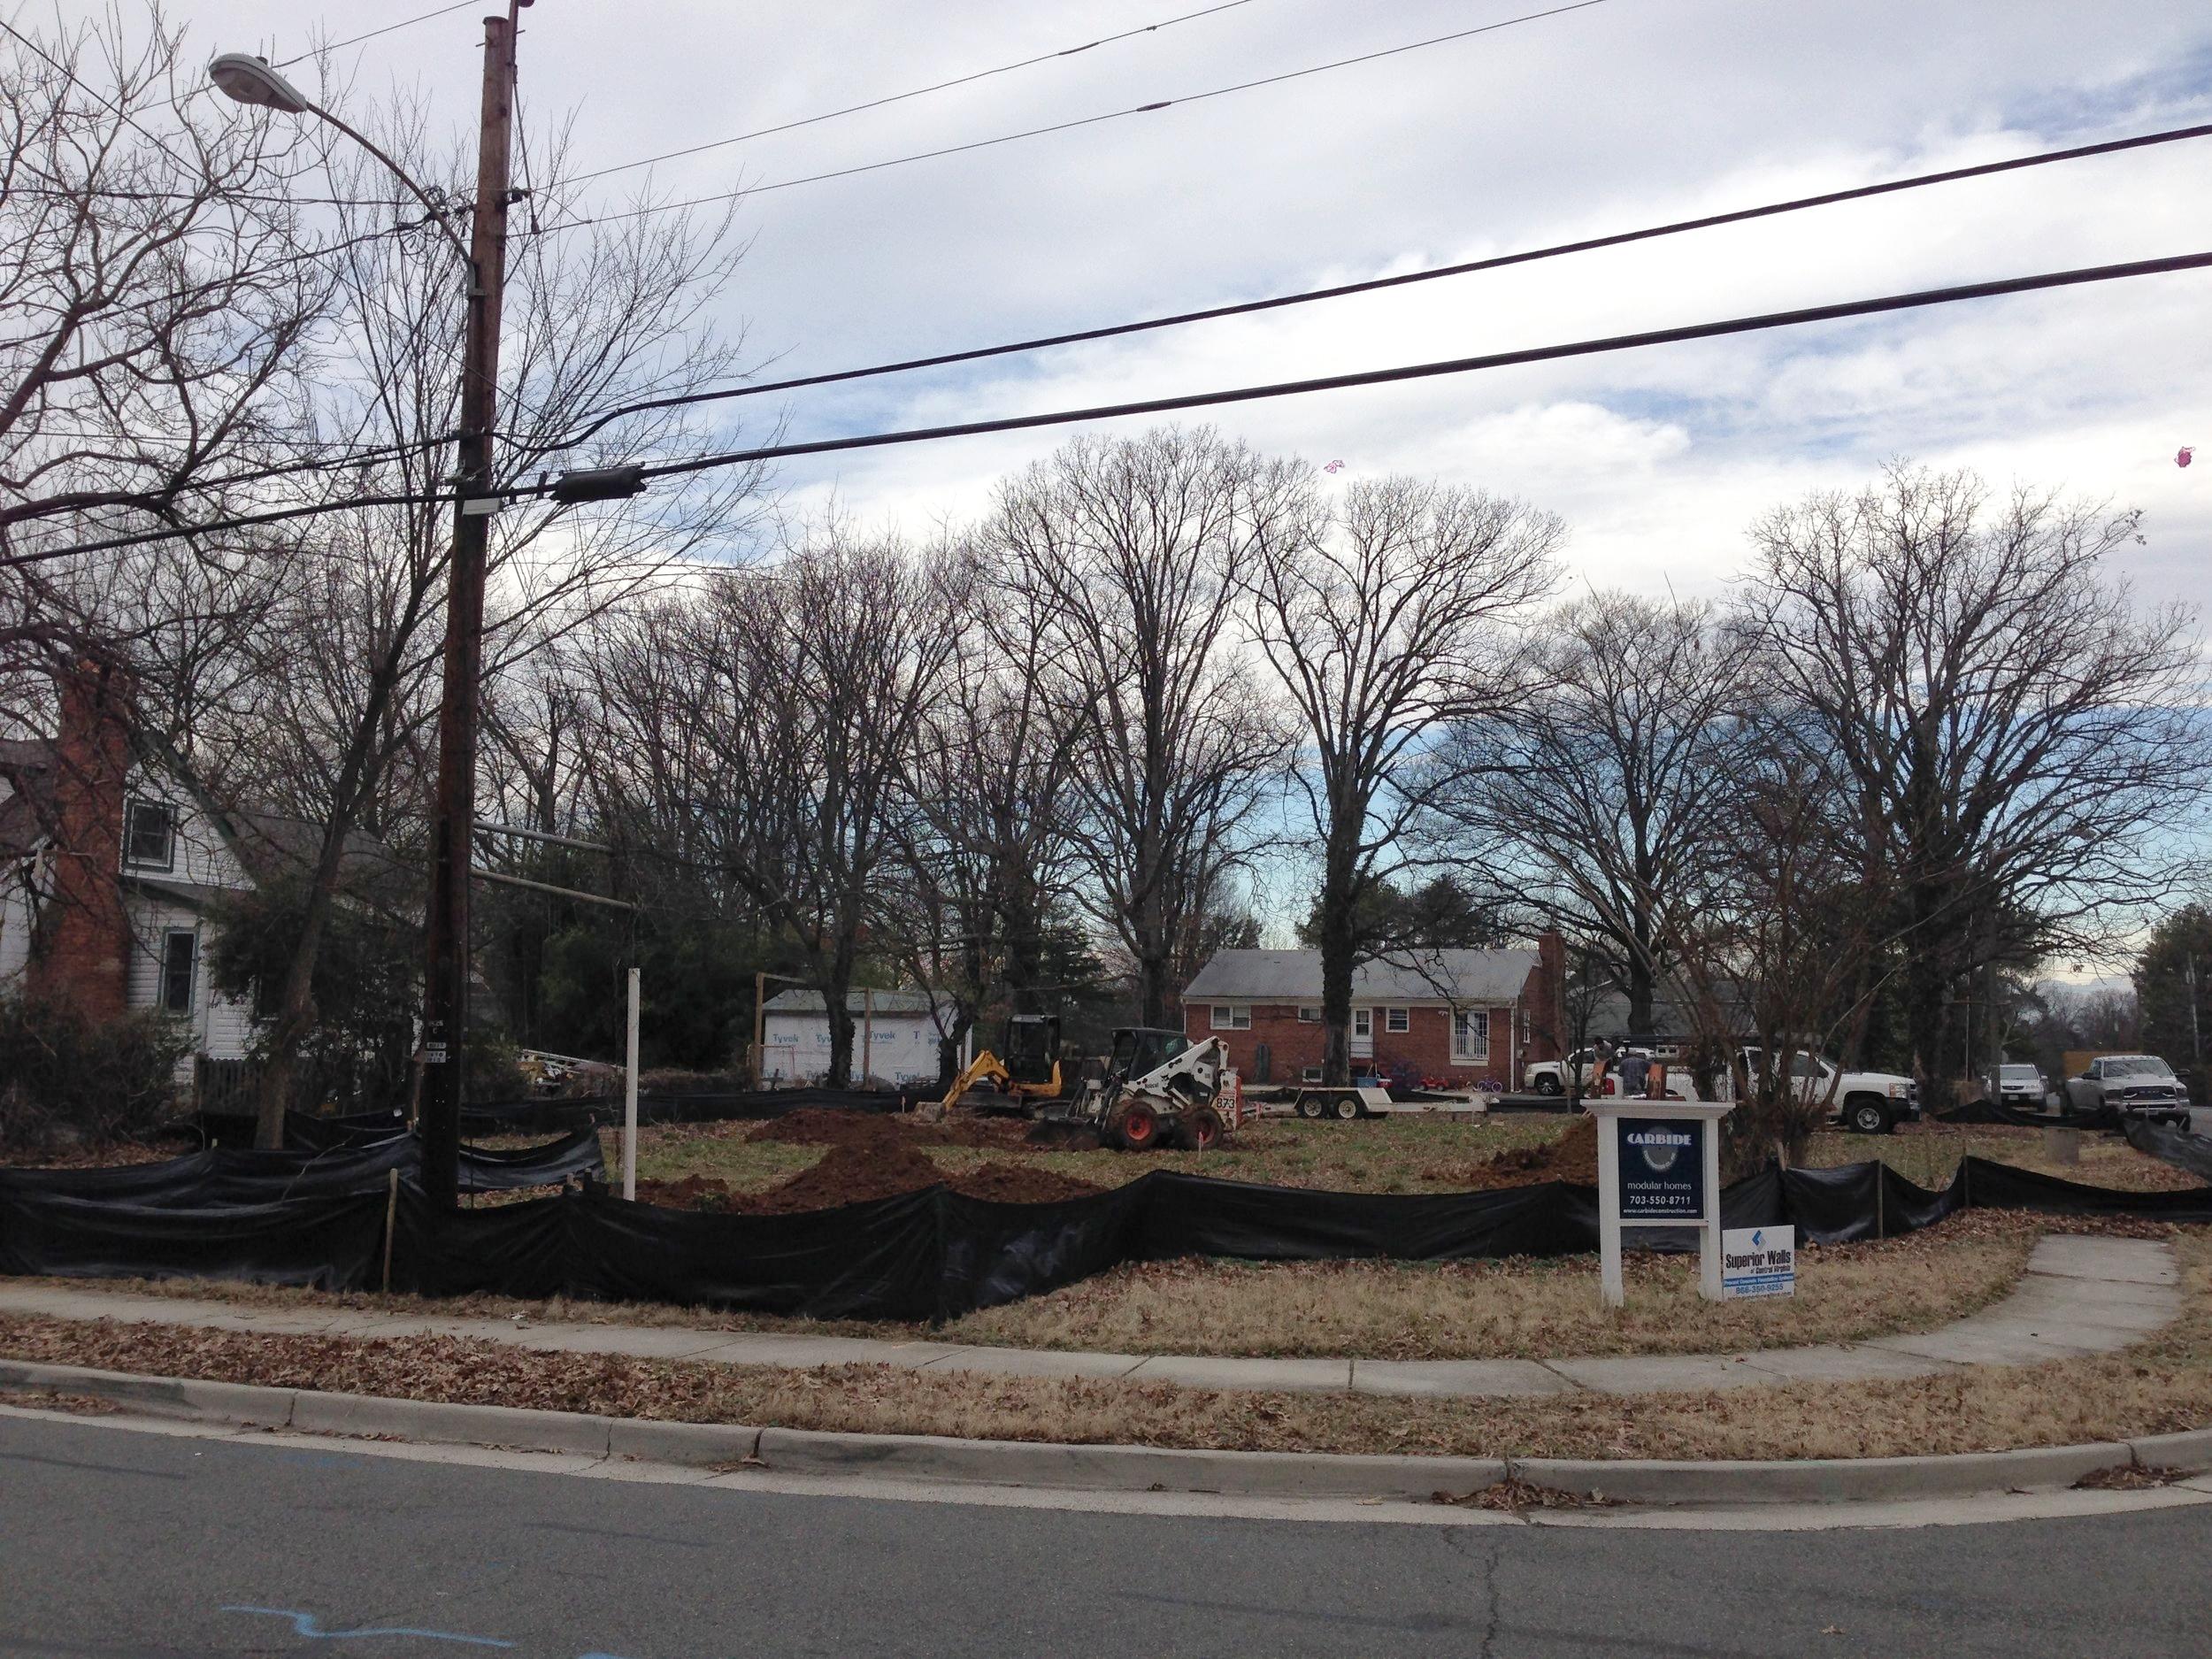 A Bobcat and Excavator finally making progress.